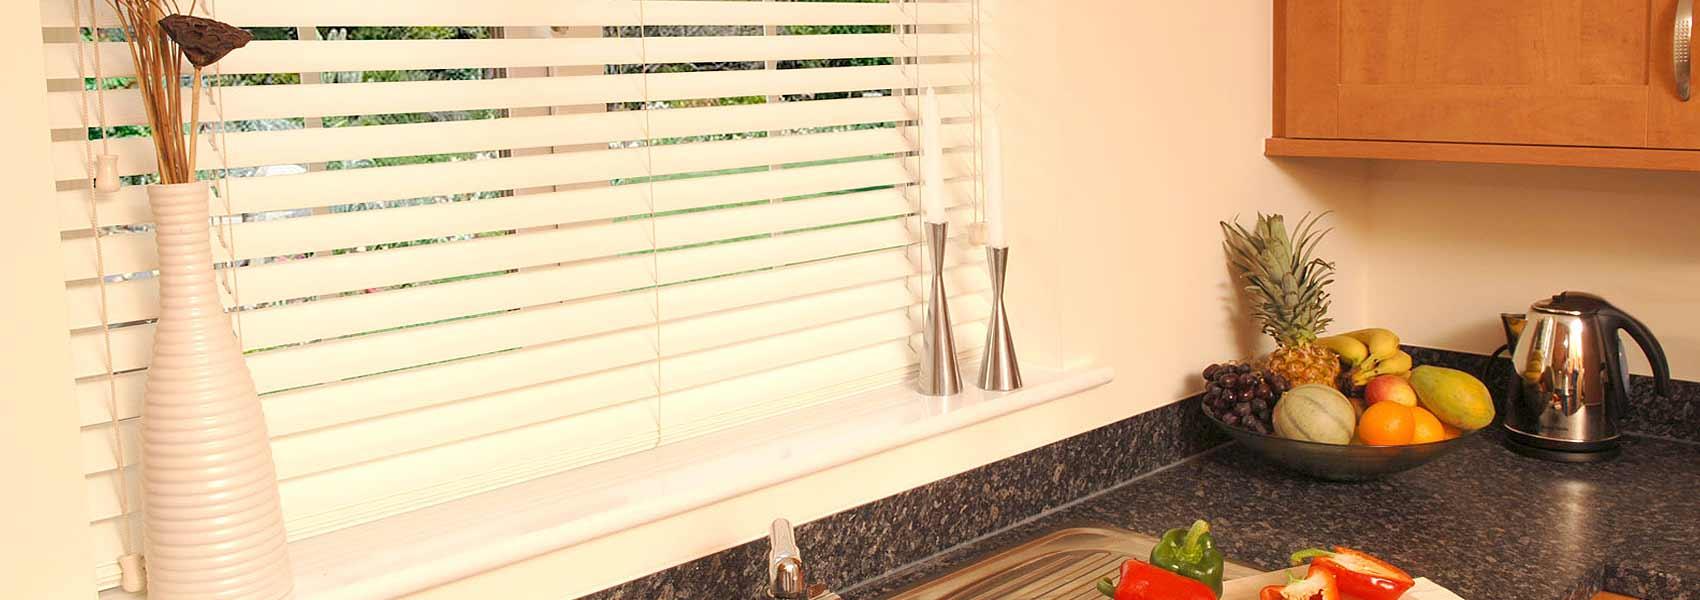 Window Blinds in Kerala, Vertical Blinds, Designer Blinds ... for Bamboo Curtains Kerala  570bof